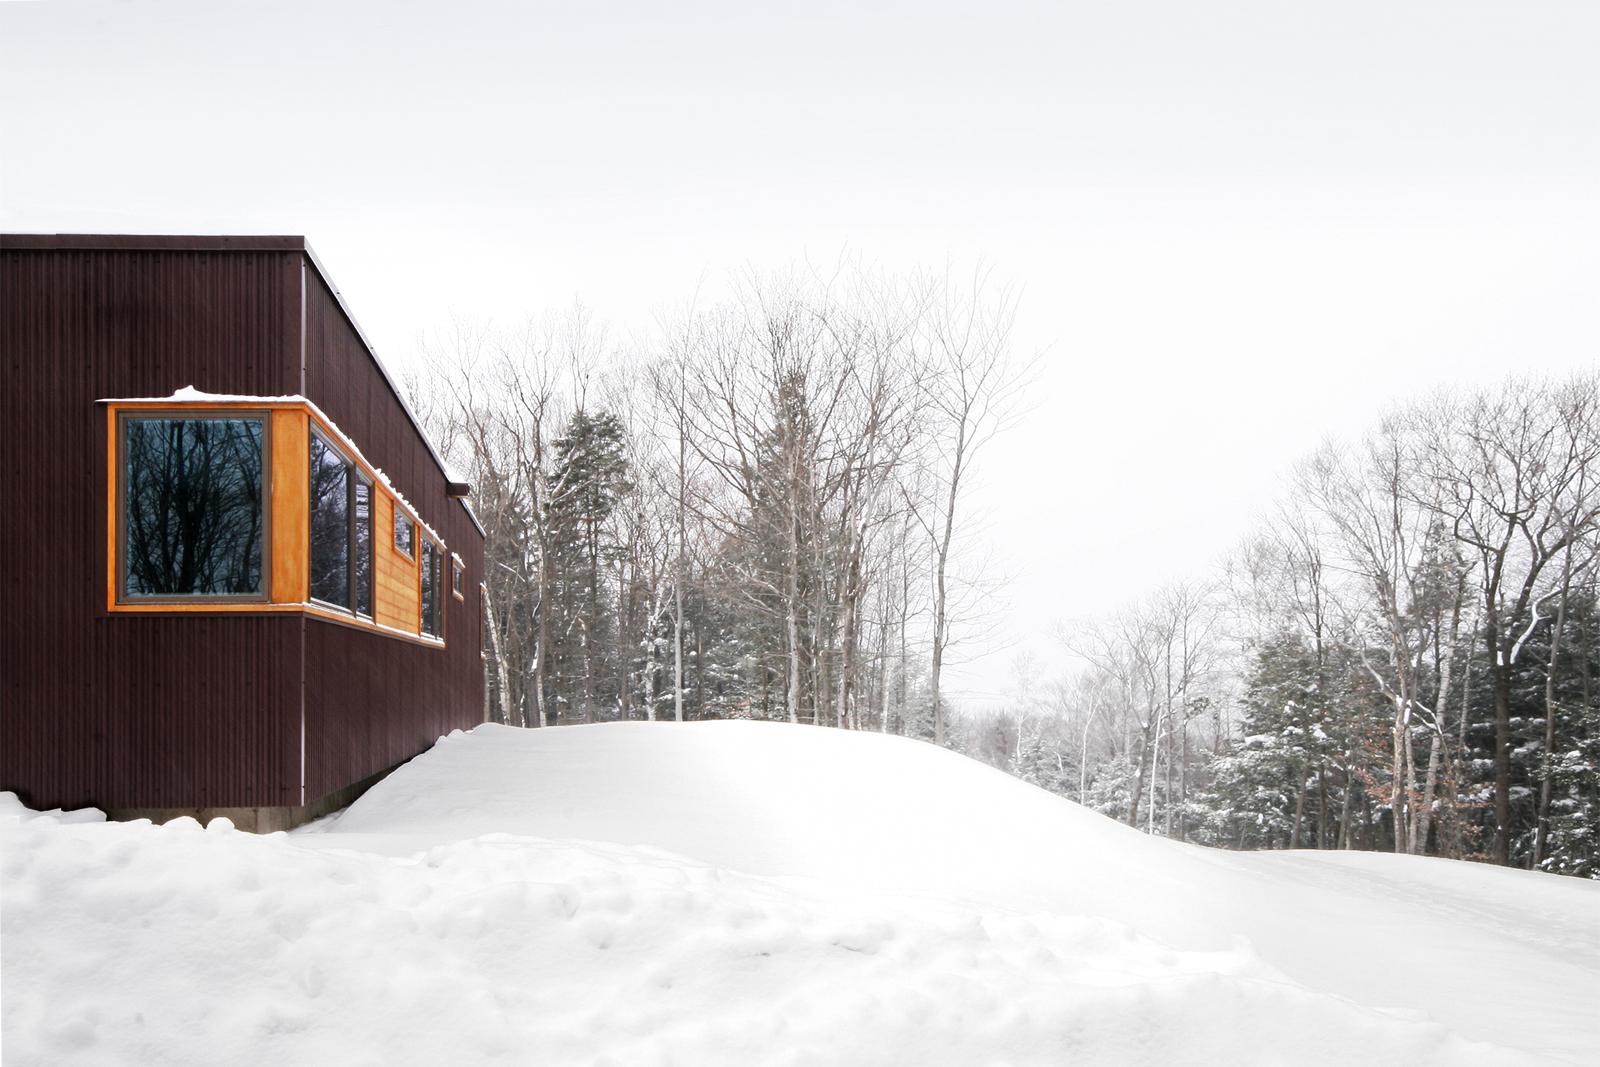 13-res4-resolution-4-architecture-modern-modular-home-prefab-house-vermont-cabin-exterior.jpg